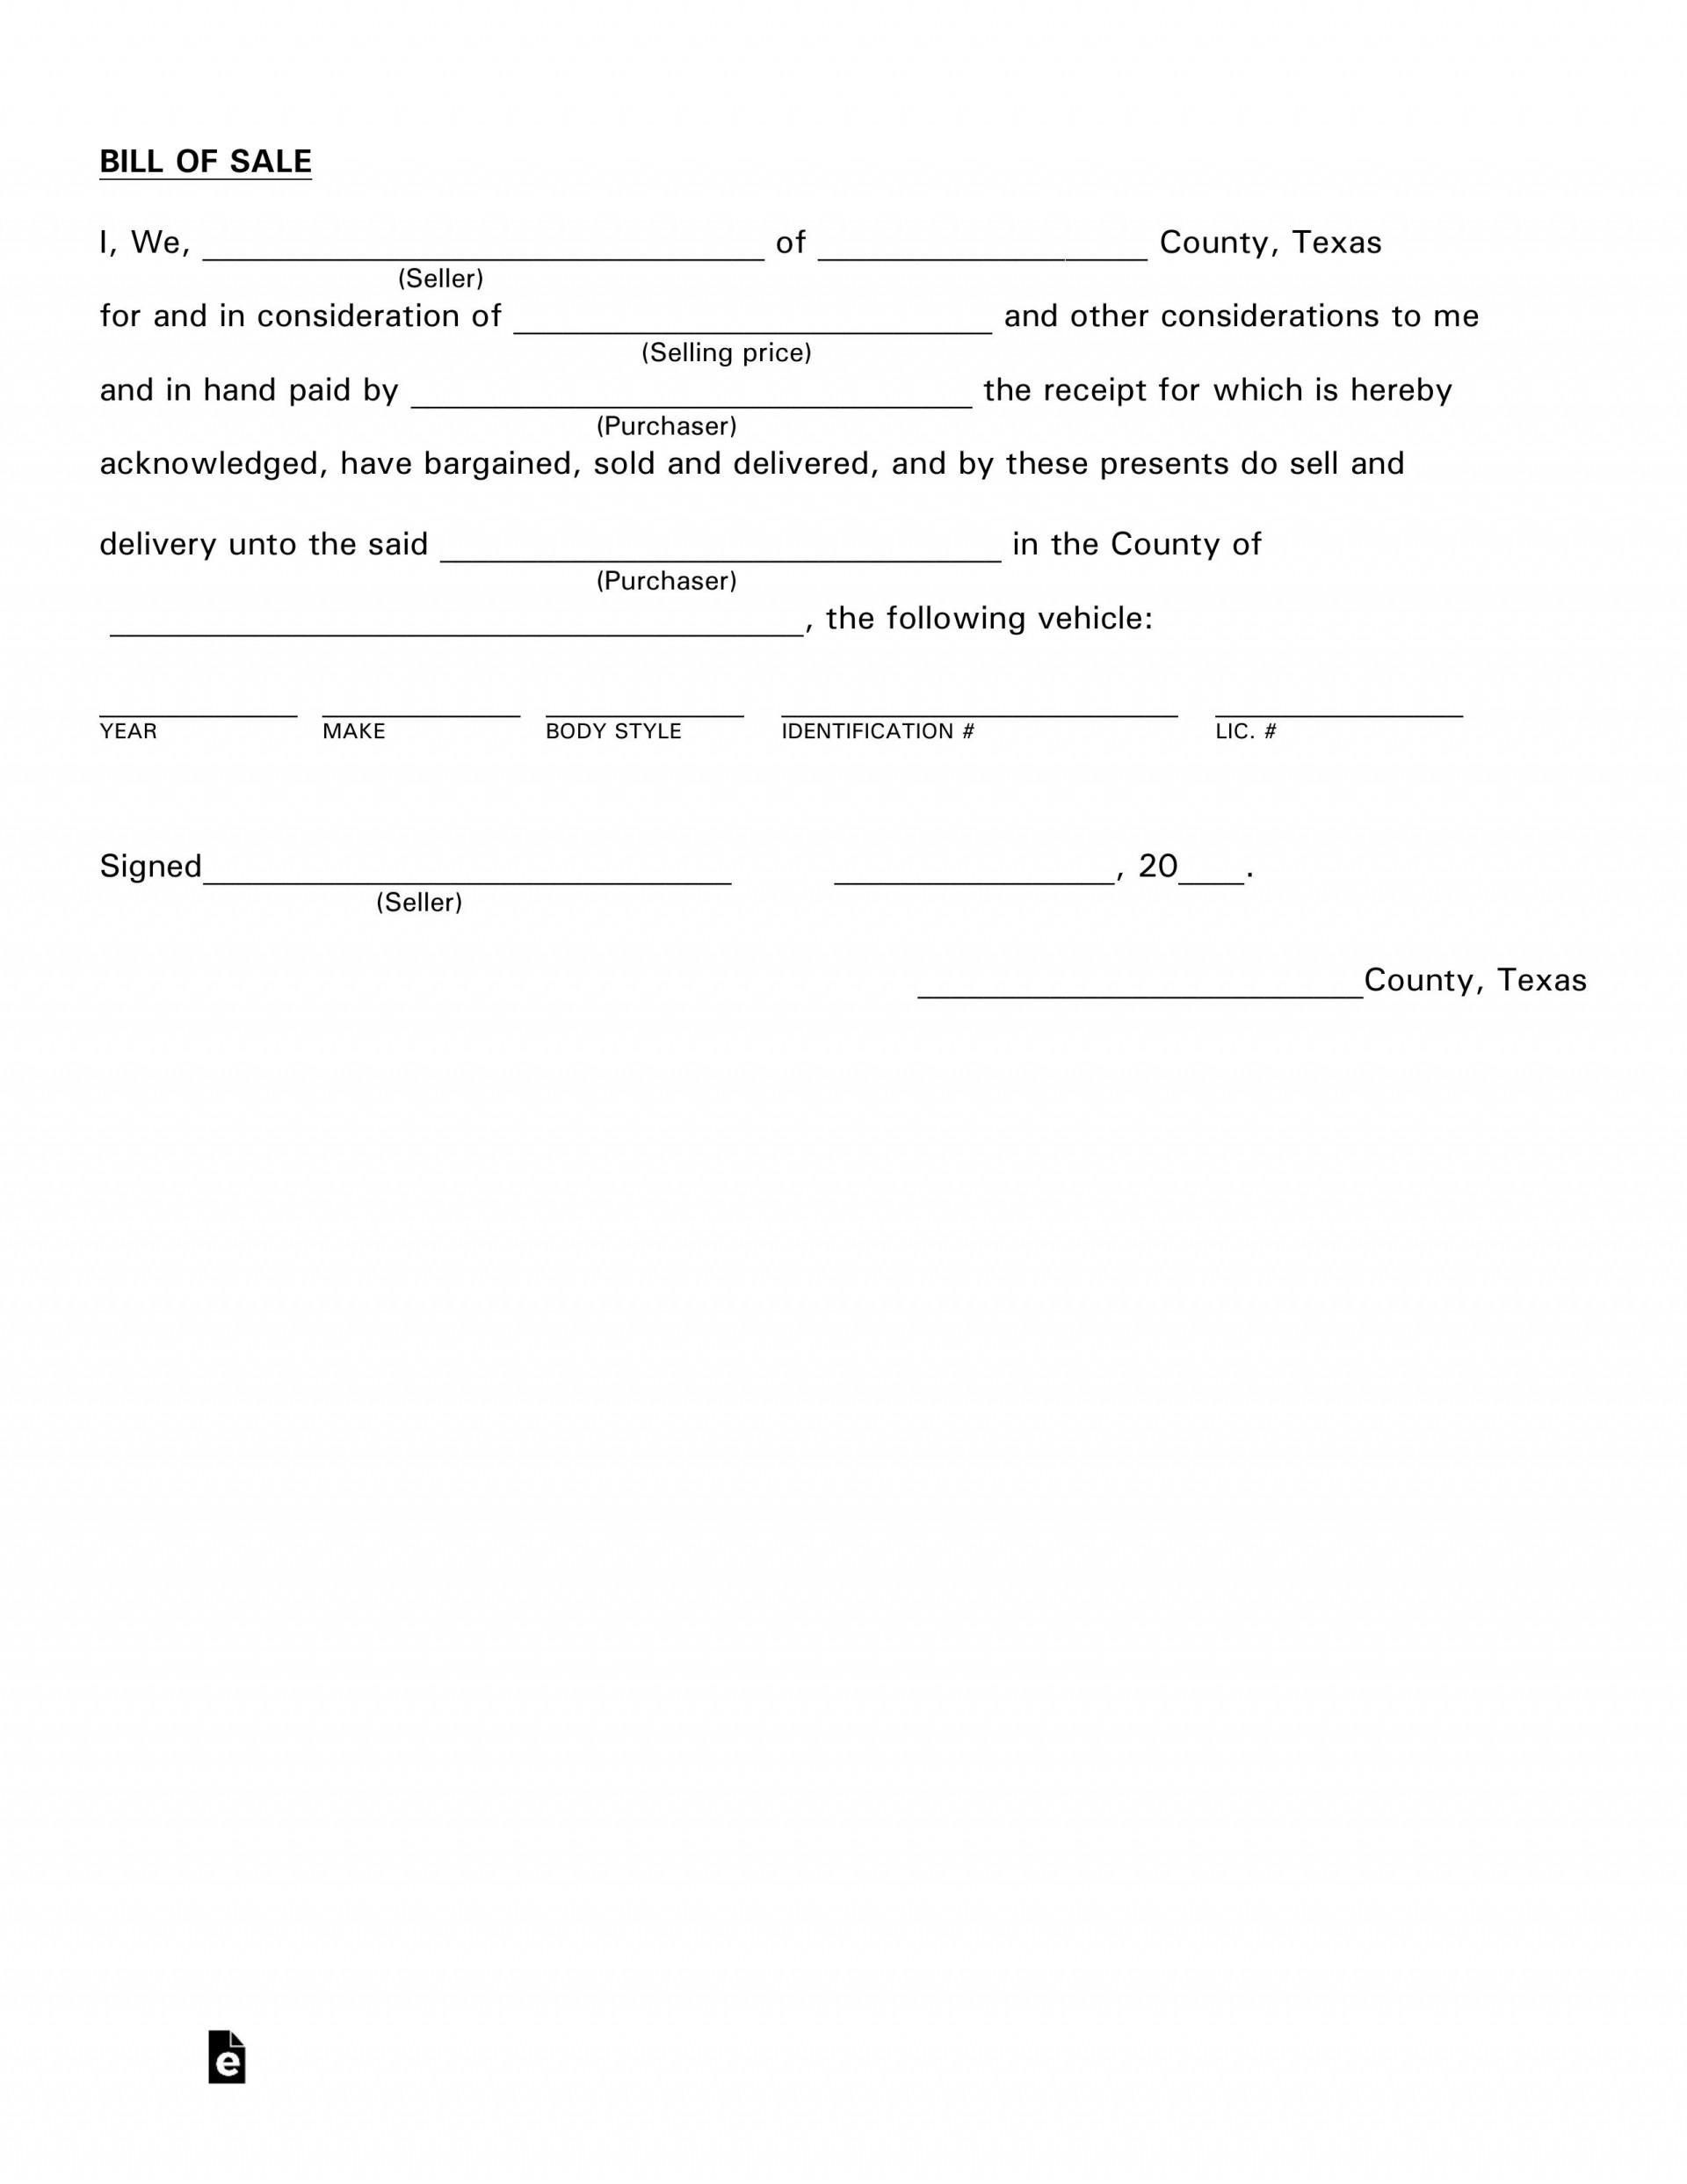 007 Imposing Bill Of Sale Template Texa Concept  Texas Free Car Form Dmv Document1920